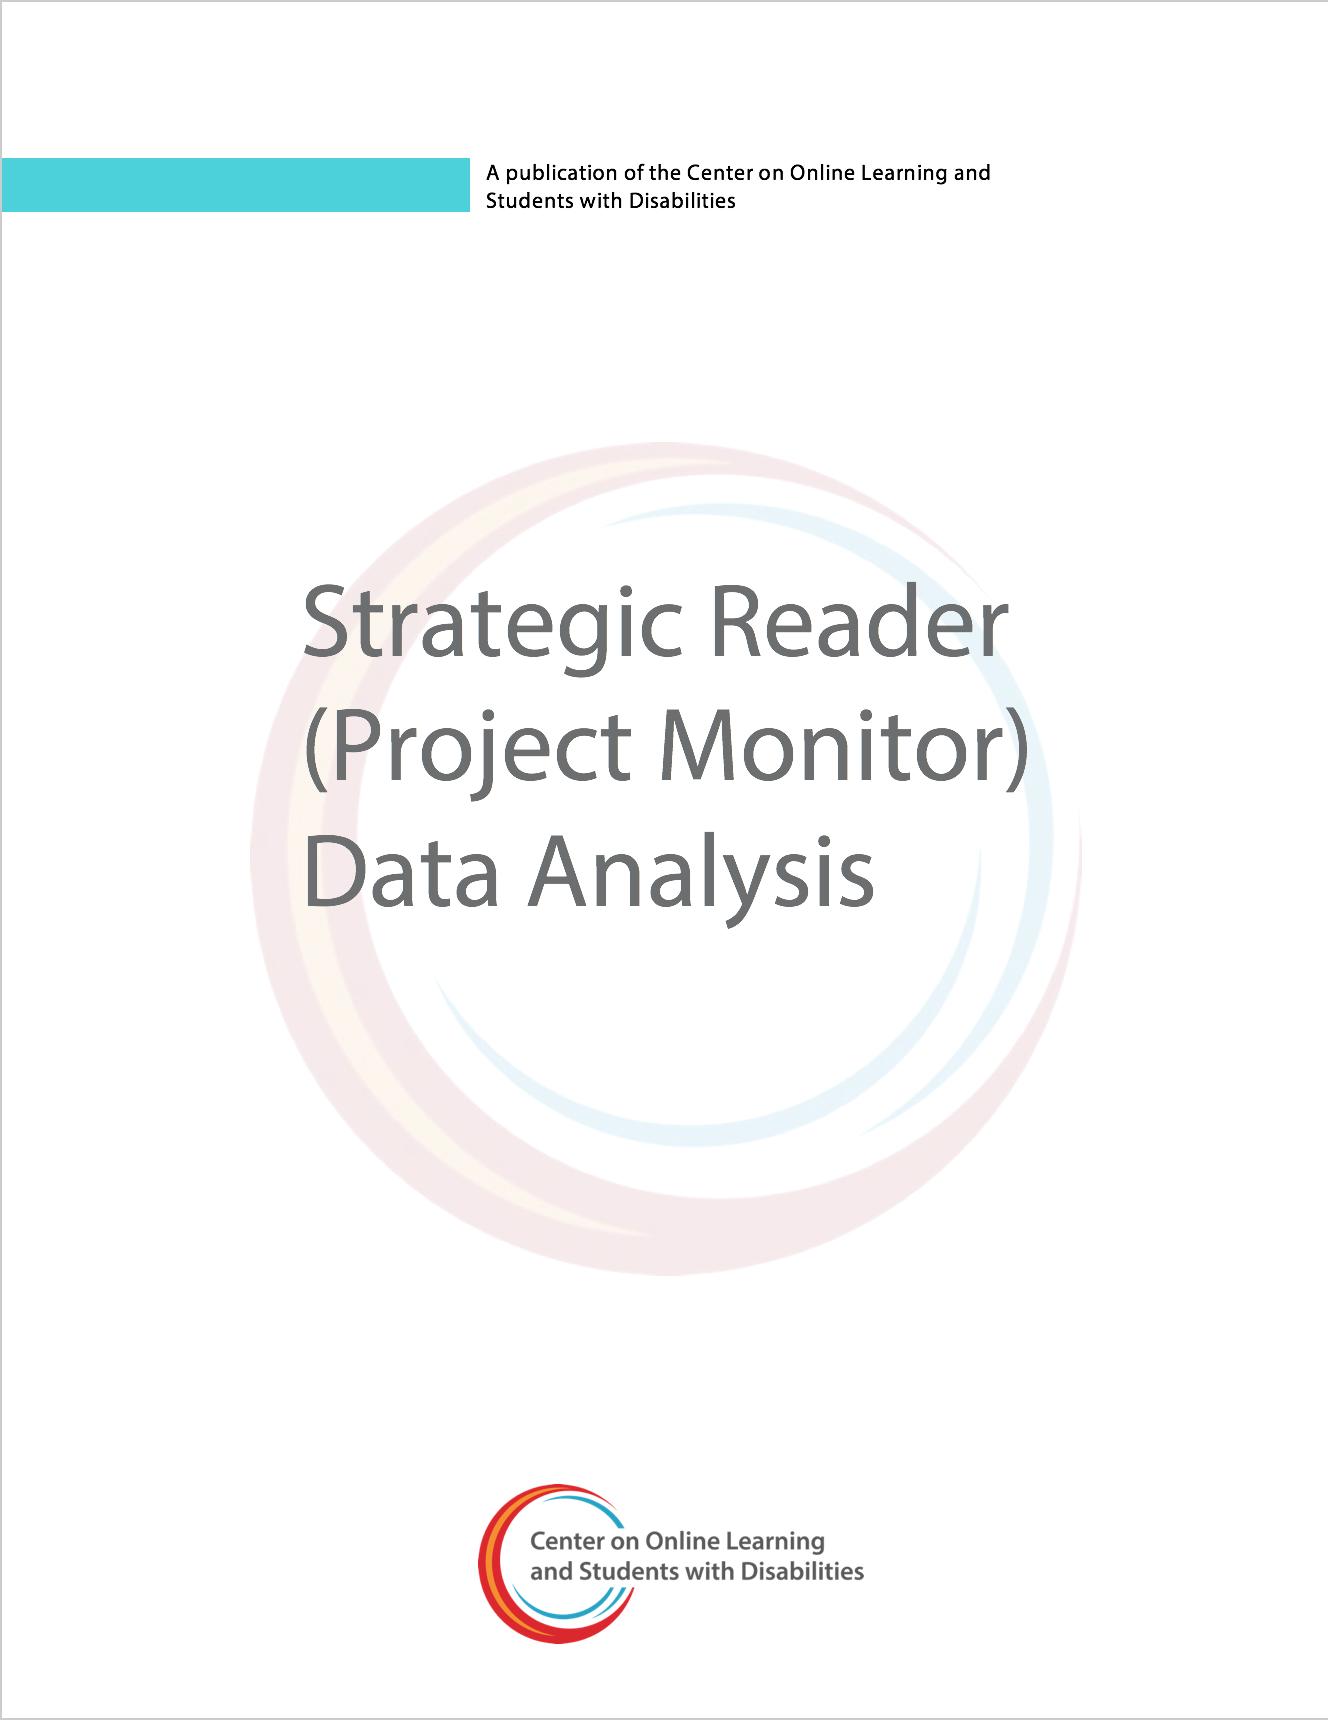 Strategic Reader (Project Monitor) Data Analysis